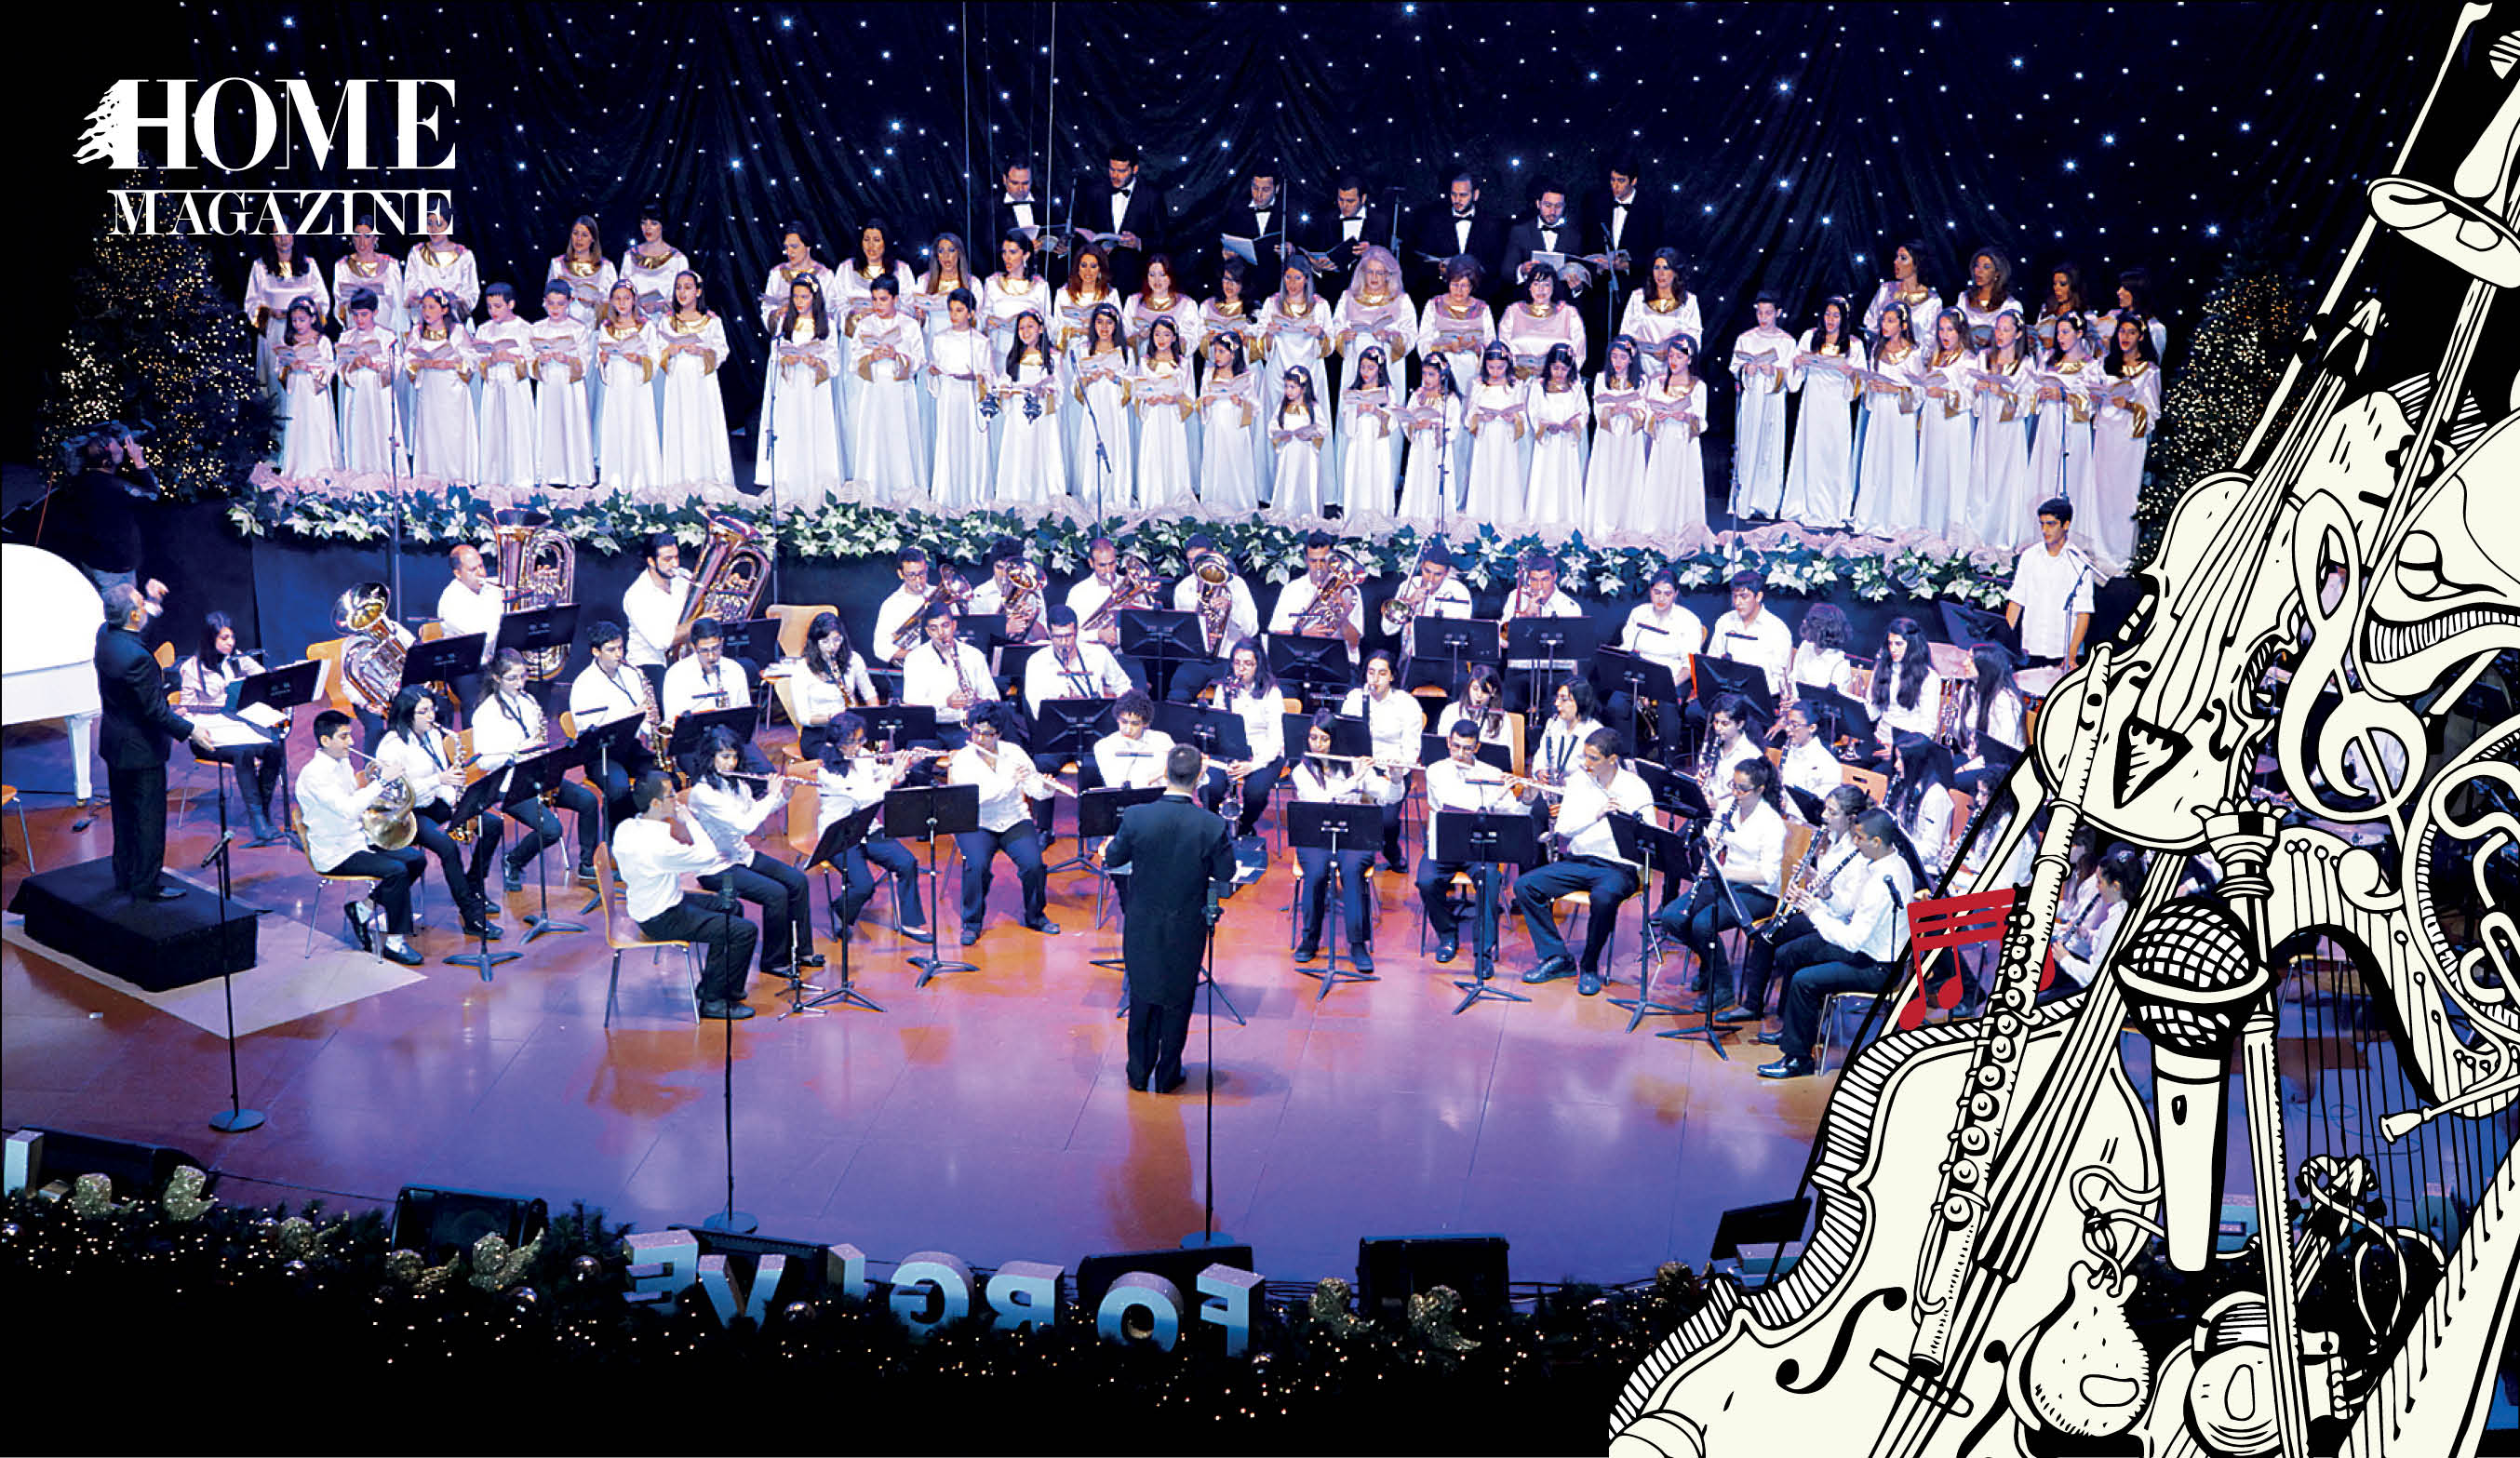 LeBAM, Transforming Lives Through Music Education